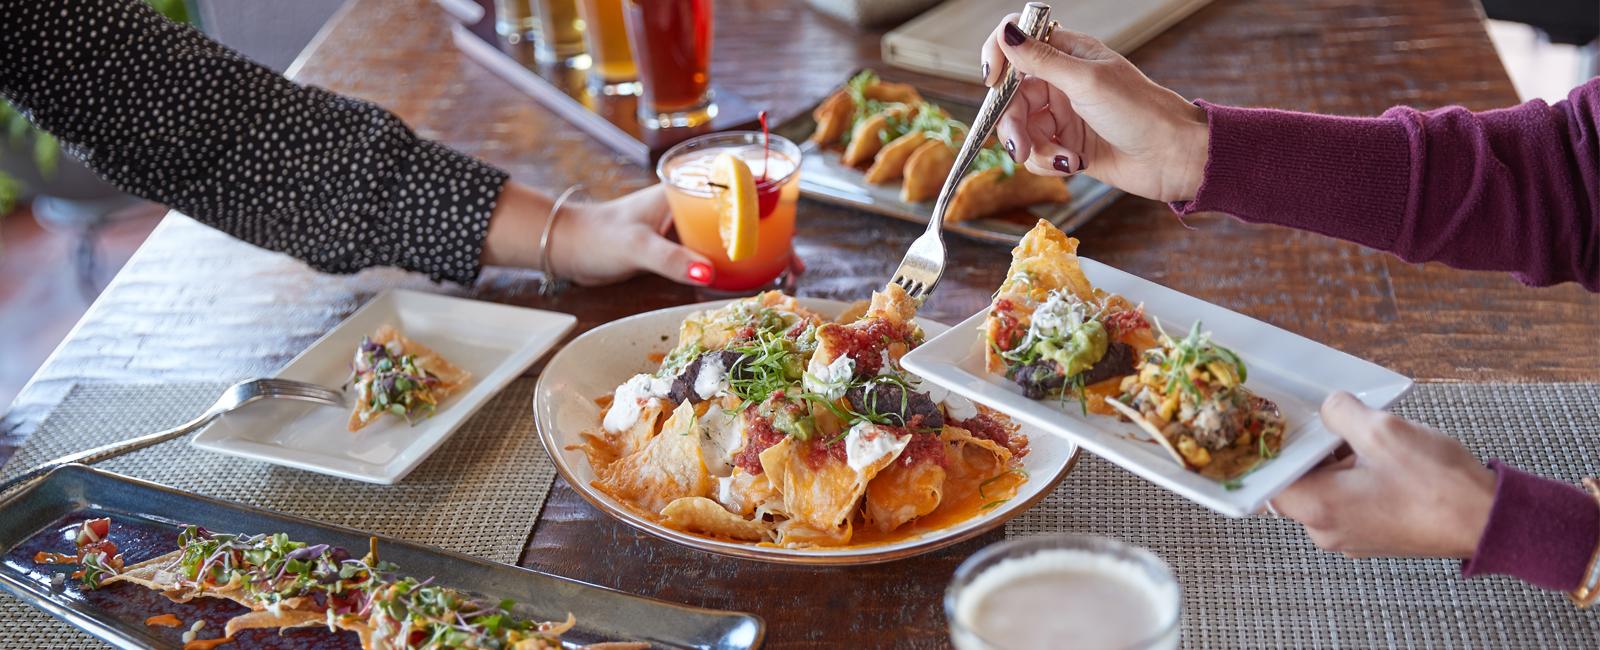 The Shores Restaurant in La Jolla